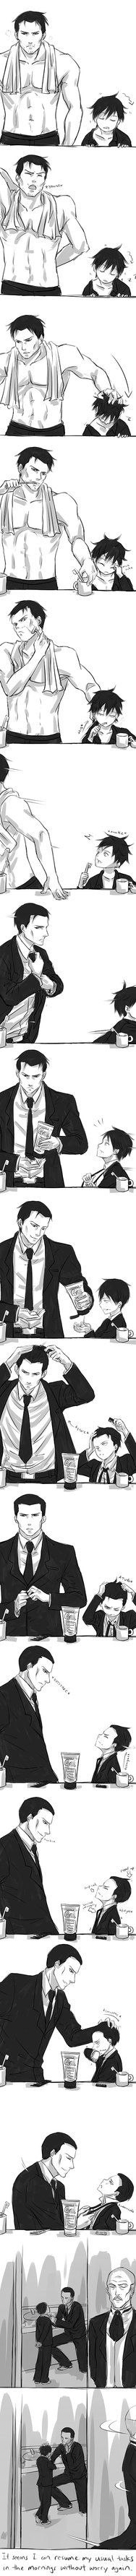 Ownn...Bruce Wayne and Little Dick Grayson :)